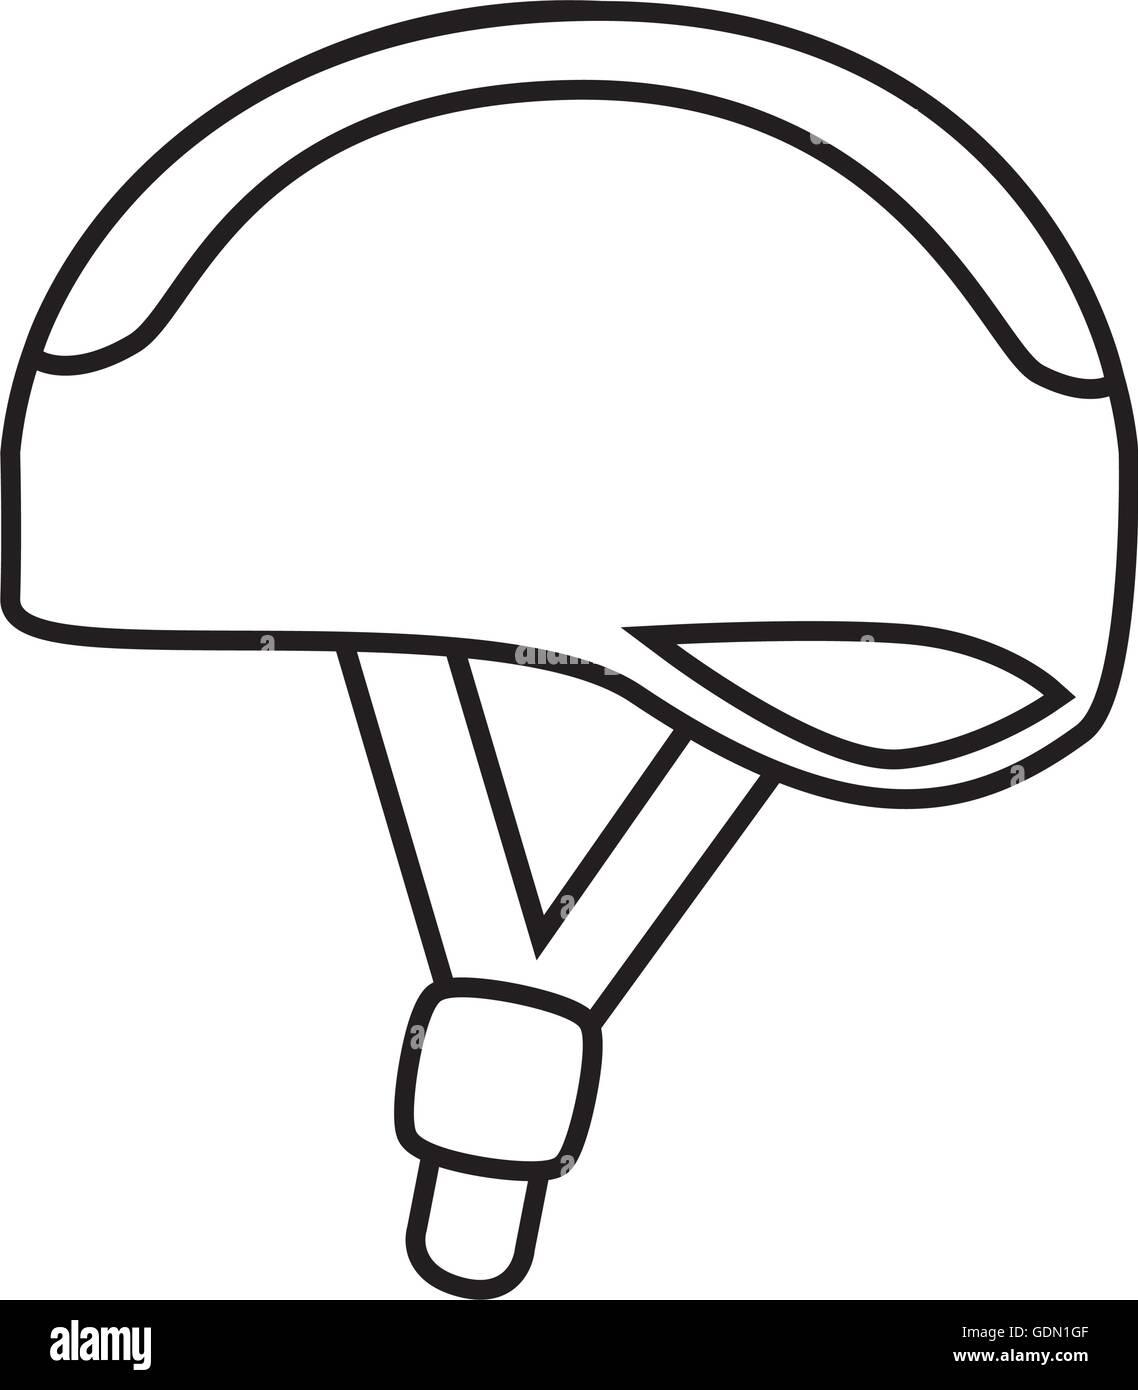 Bike Helmet Safety Icon Vector Illustration Design Stock